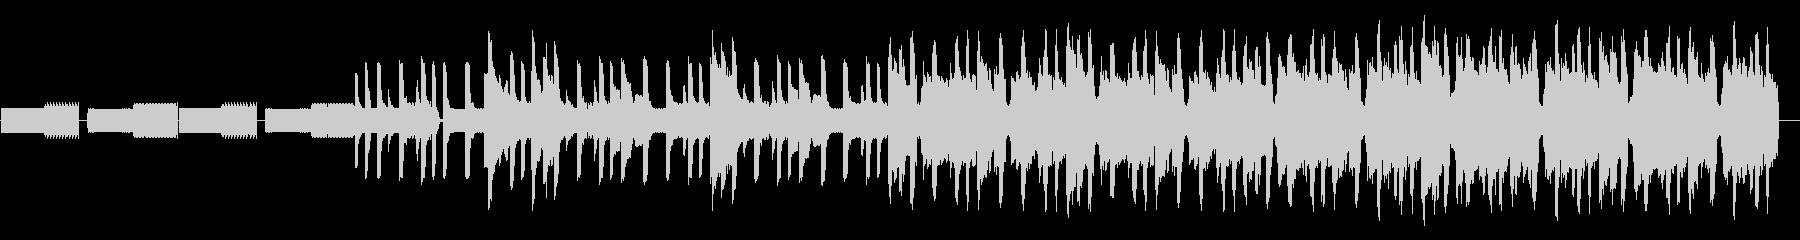 8bitリフのループとコミカルなシンセの未再生の波形